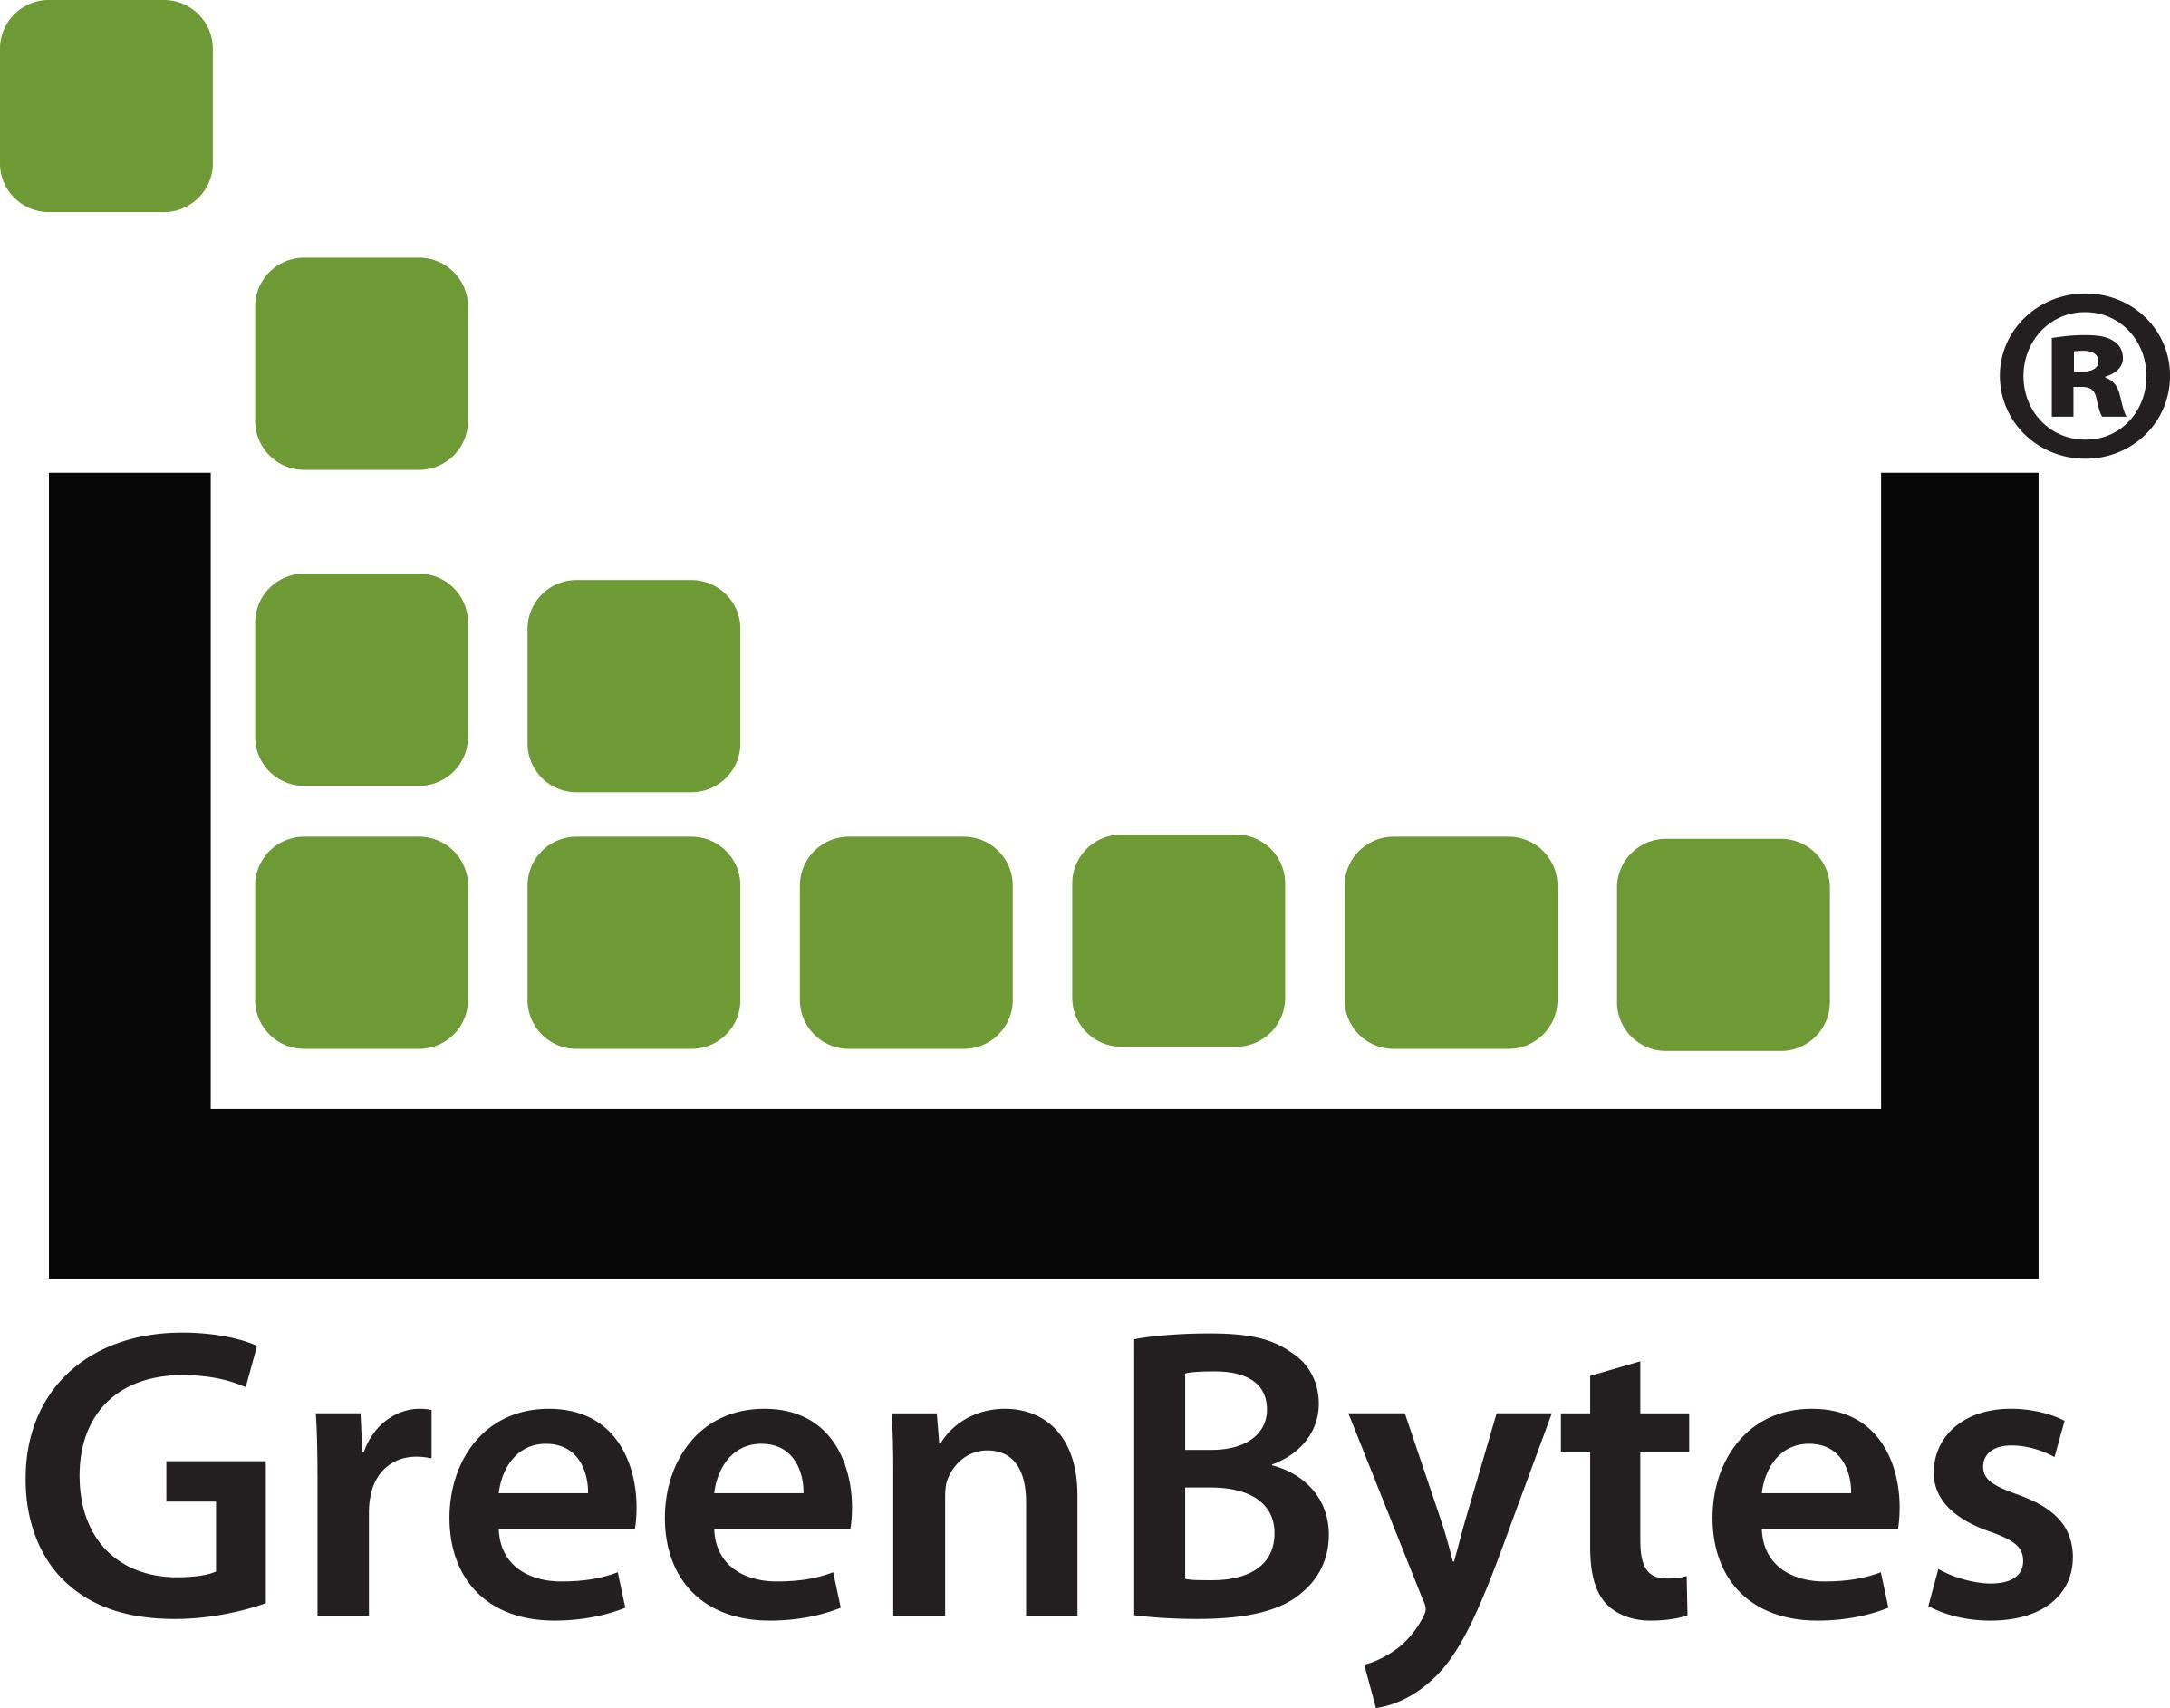 greenbytes logo.jpg